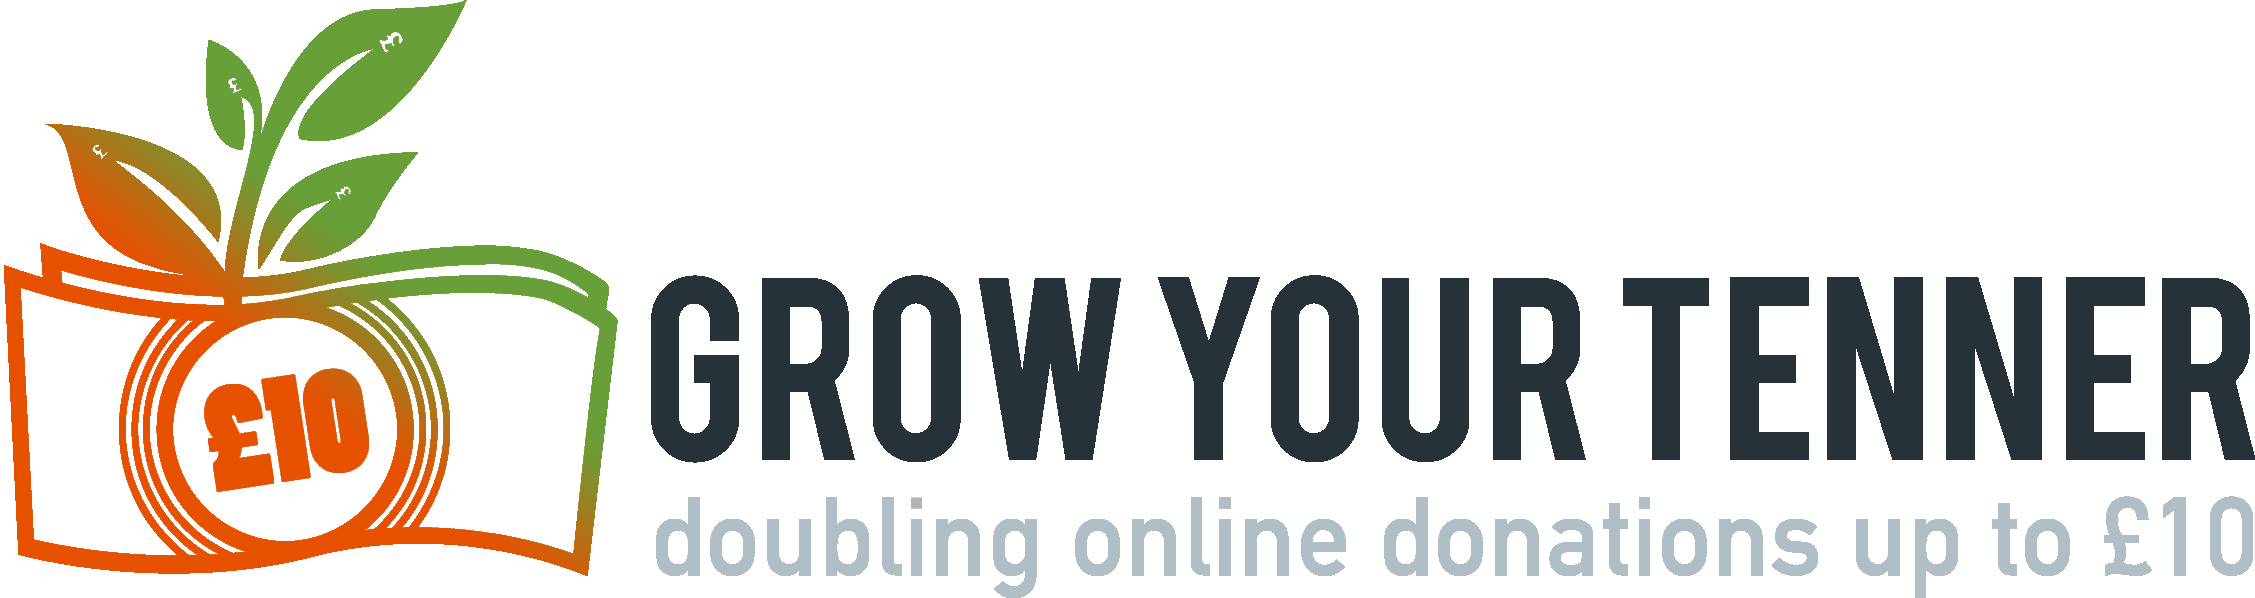 Grow Your Tenner logo 2016